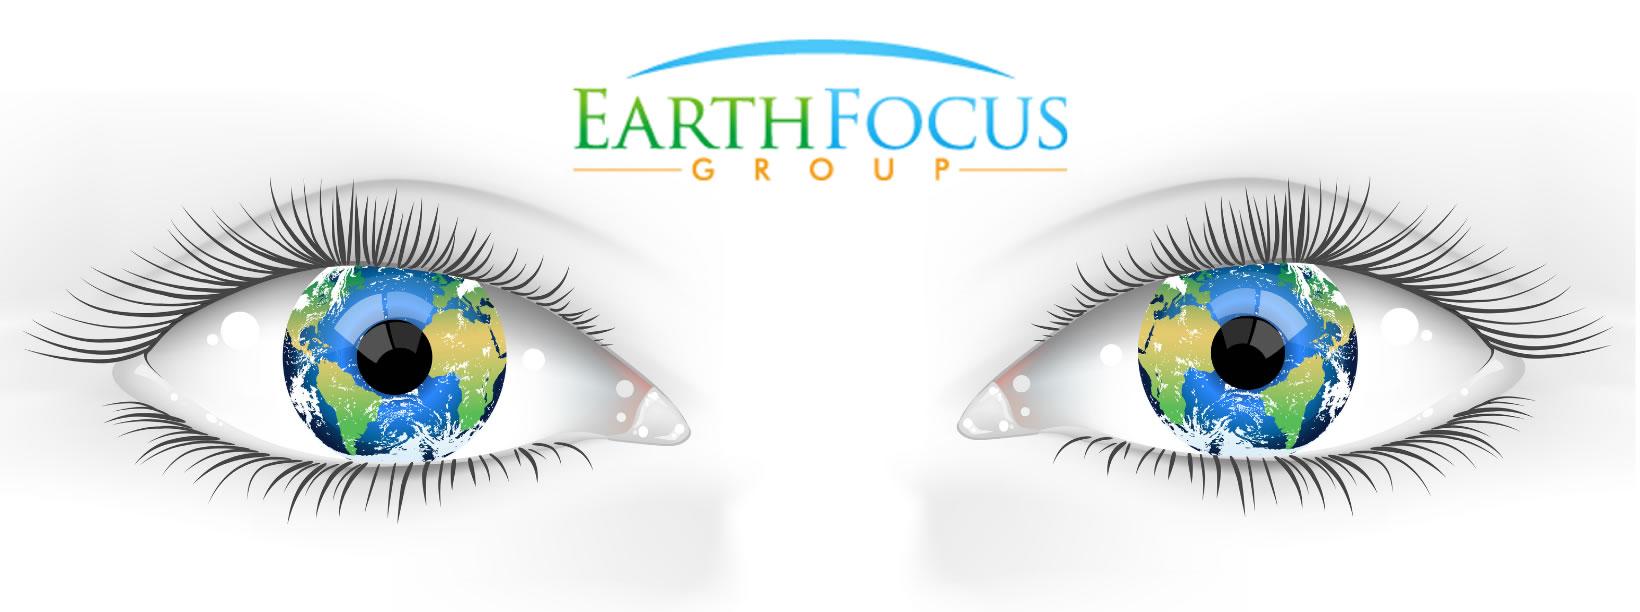 earth focus group